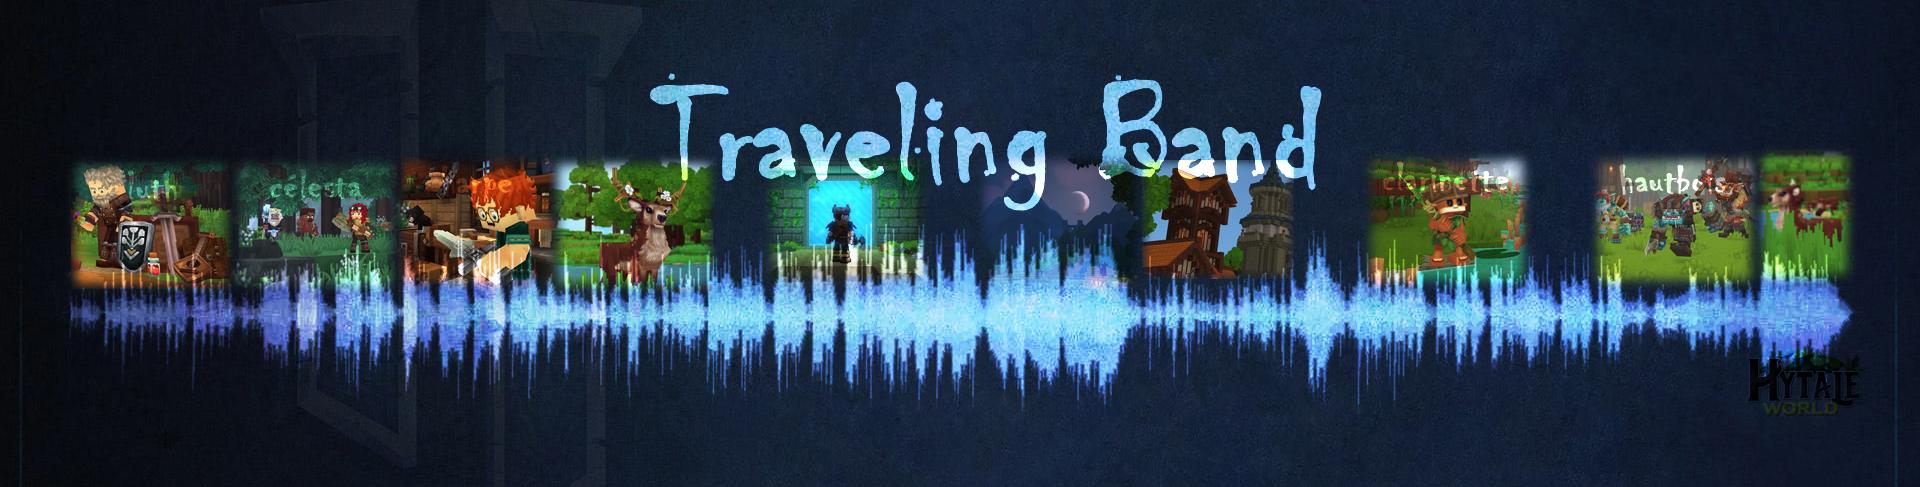 Interprétation scénarisée du titre Traveling Band d'Oscar Garvin